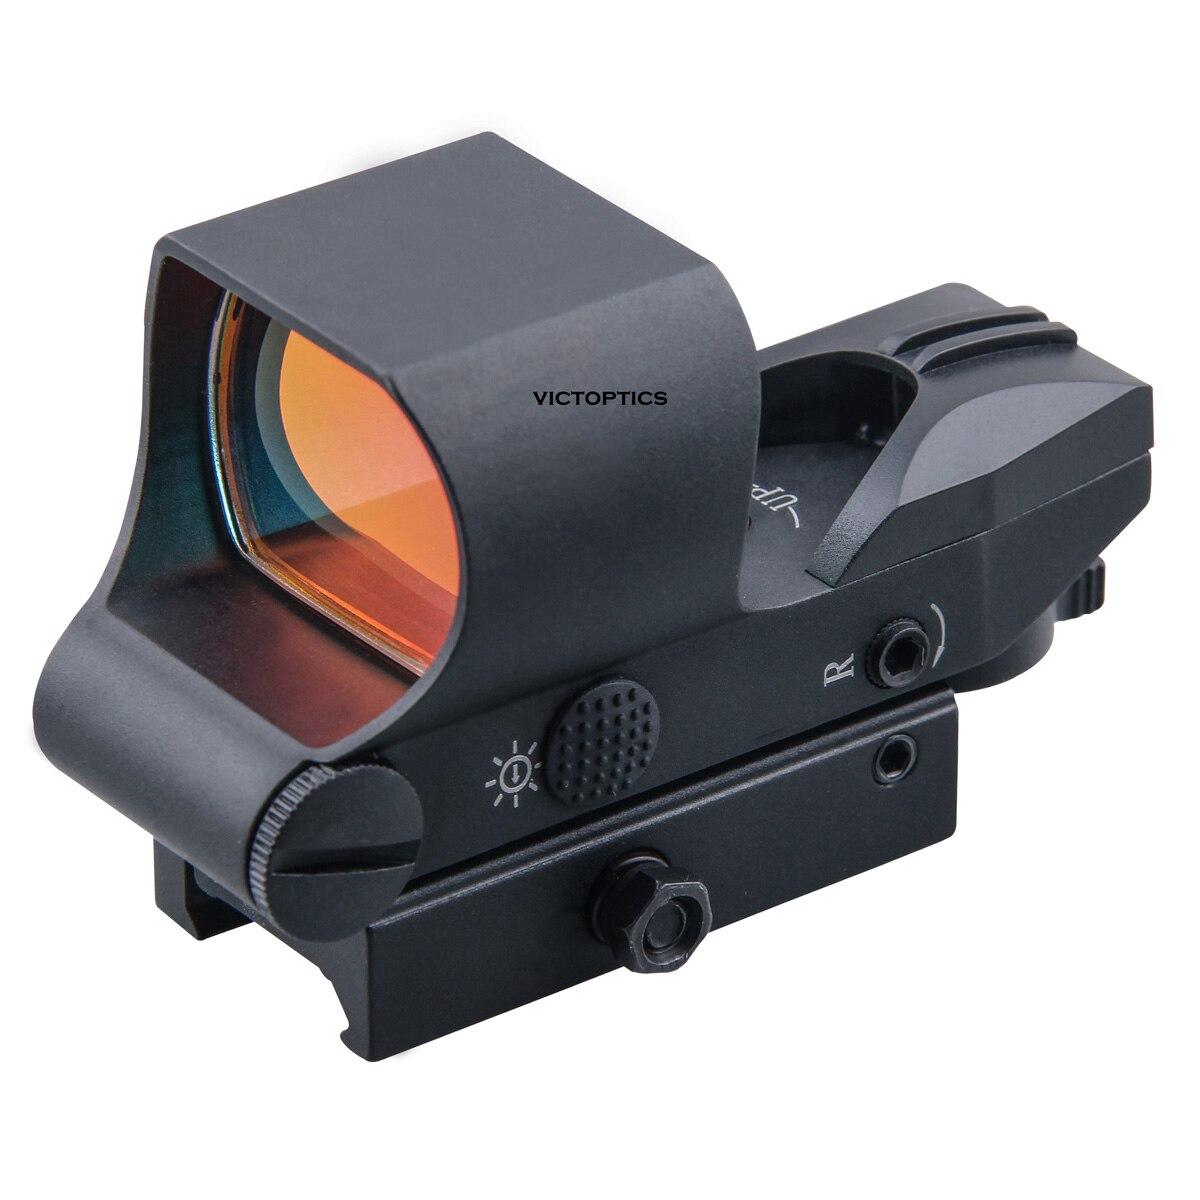 victoptics 1x28x40 reticulo sistema de bloqueio tactical red dot scope reflex sight 21mm qd picatinny montagem